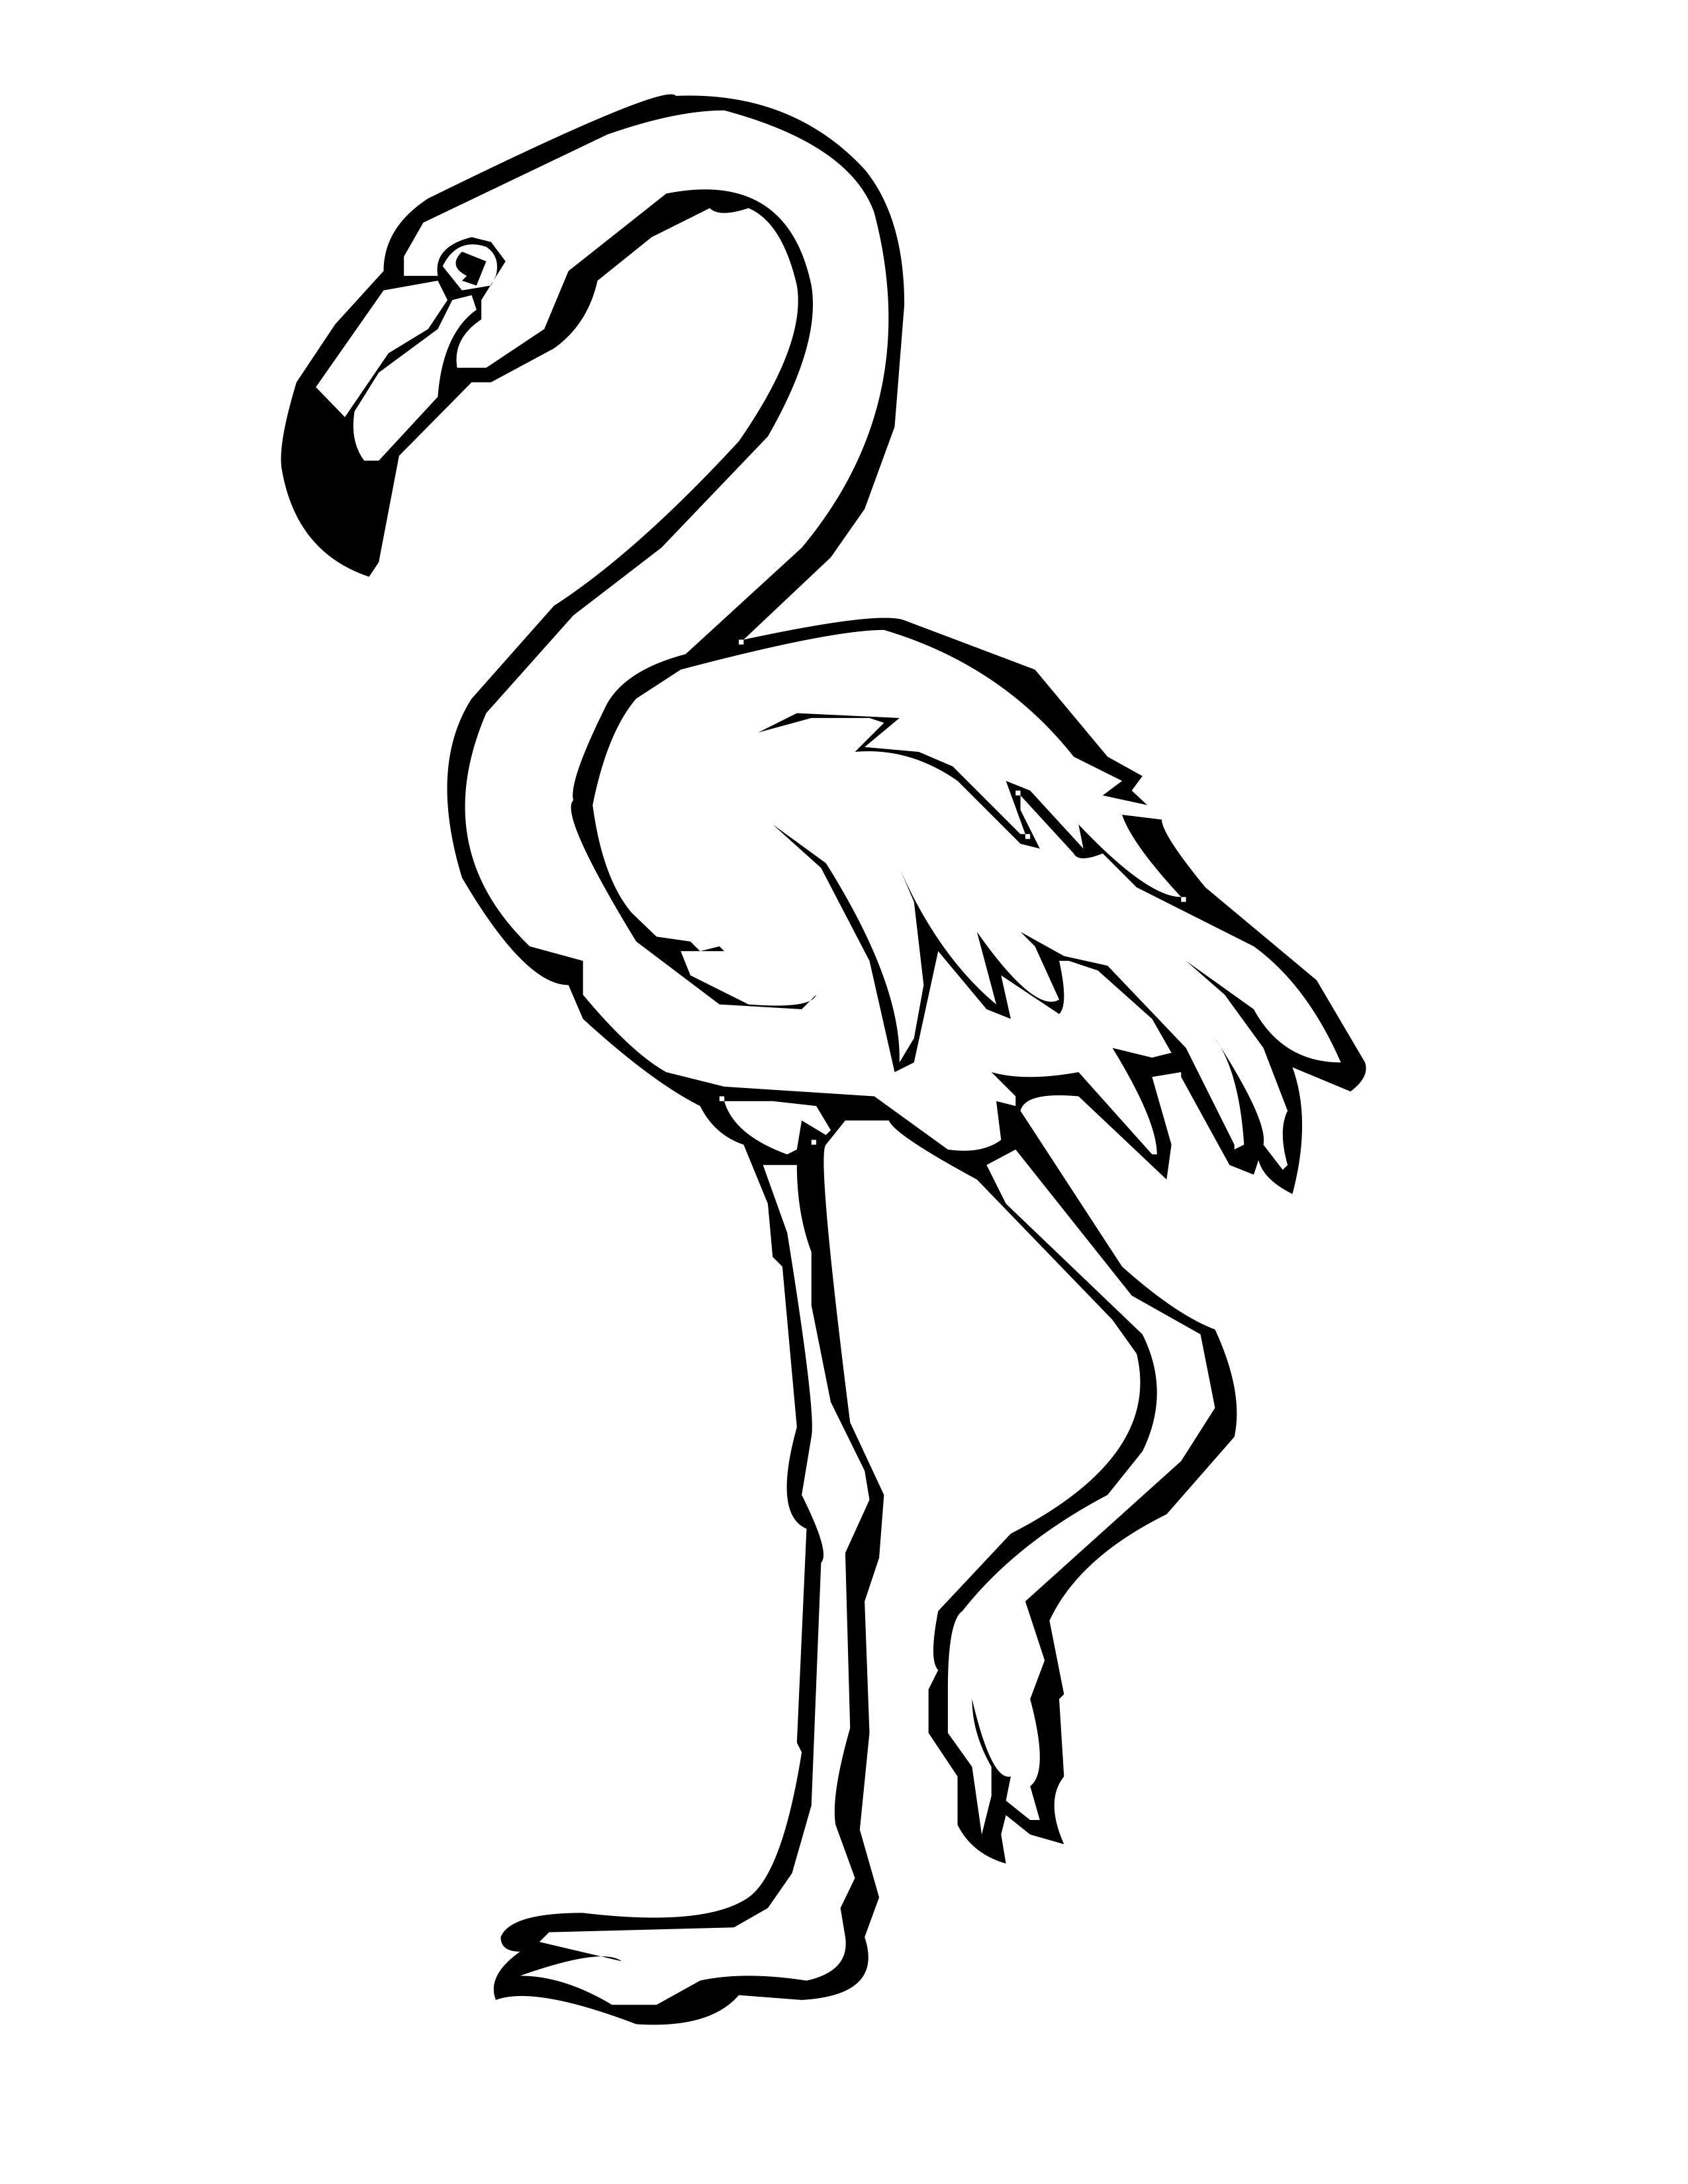 2550x3300 Cartoon Flamingo Coloring Page Pink Flamingo Coloring Page